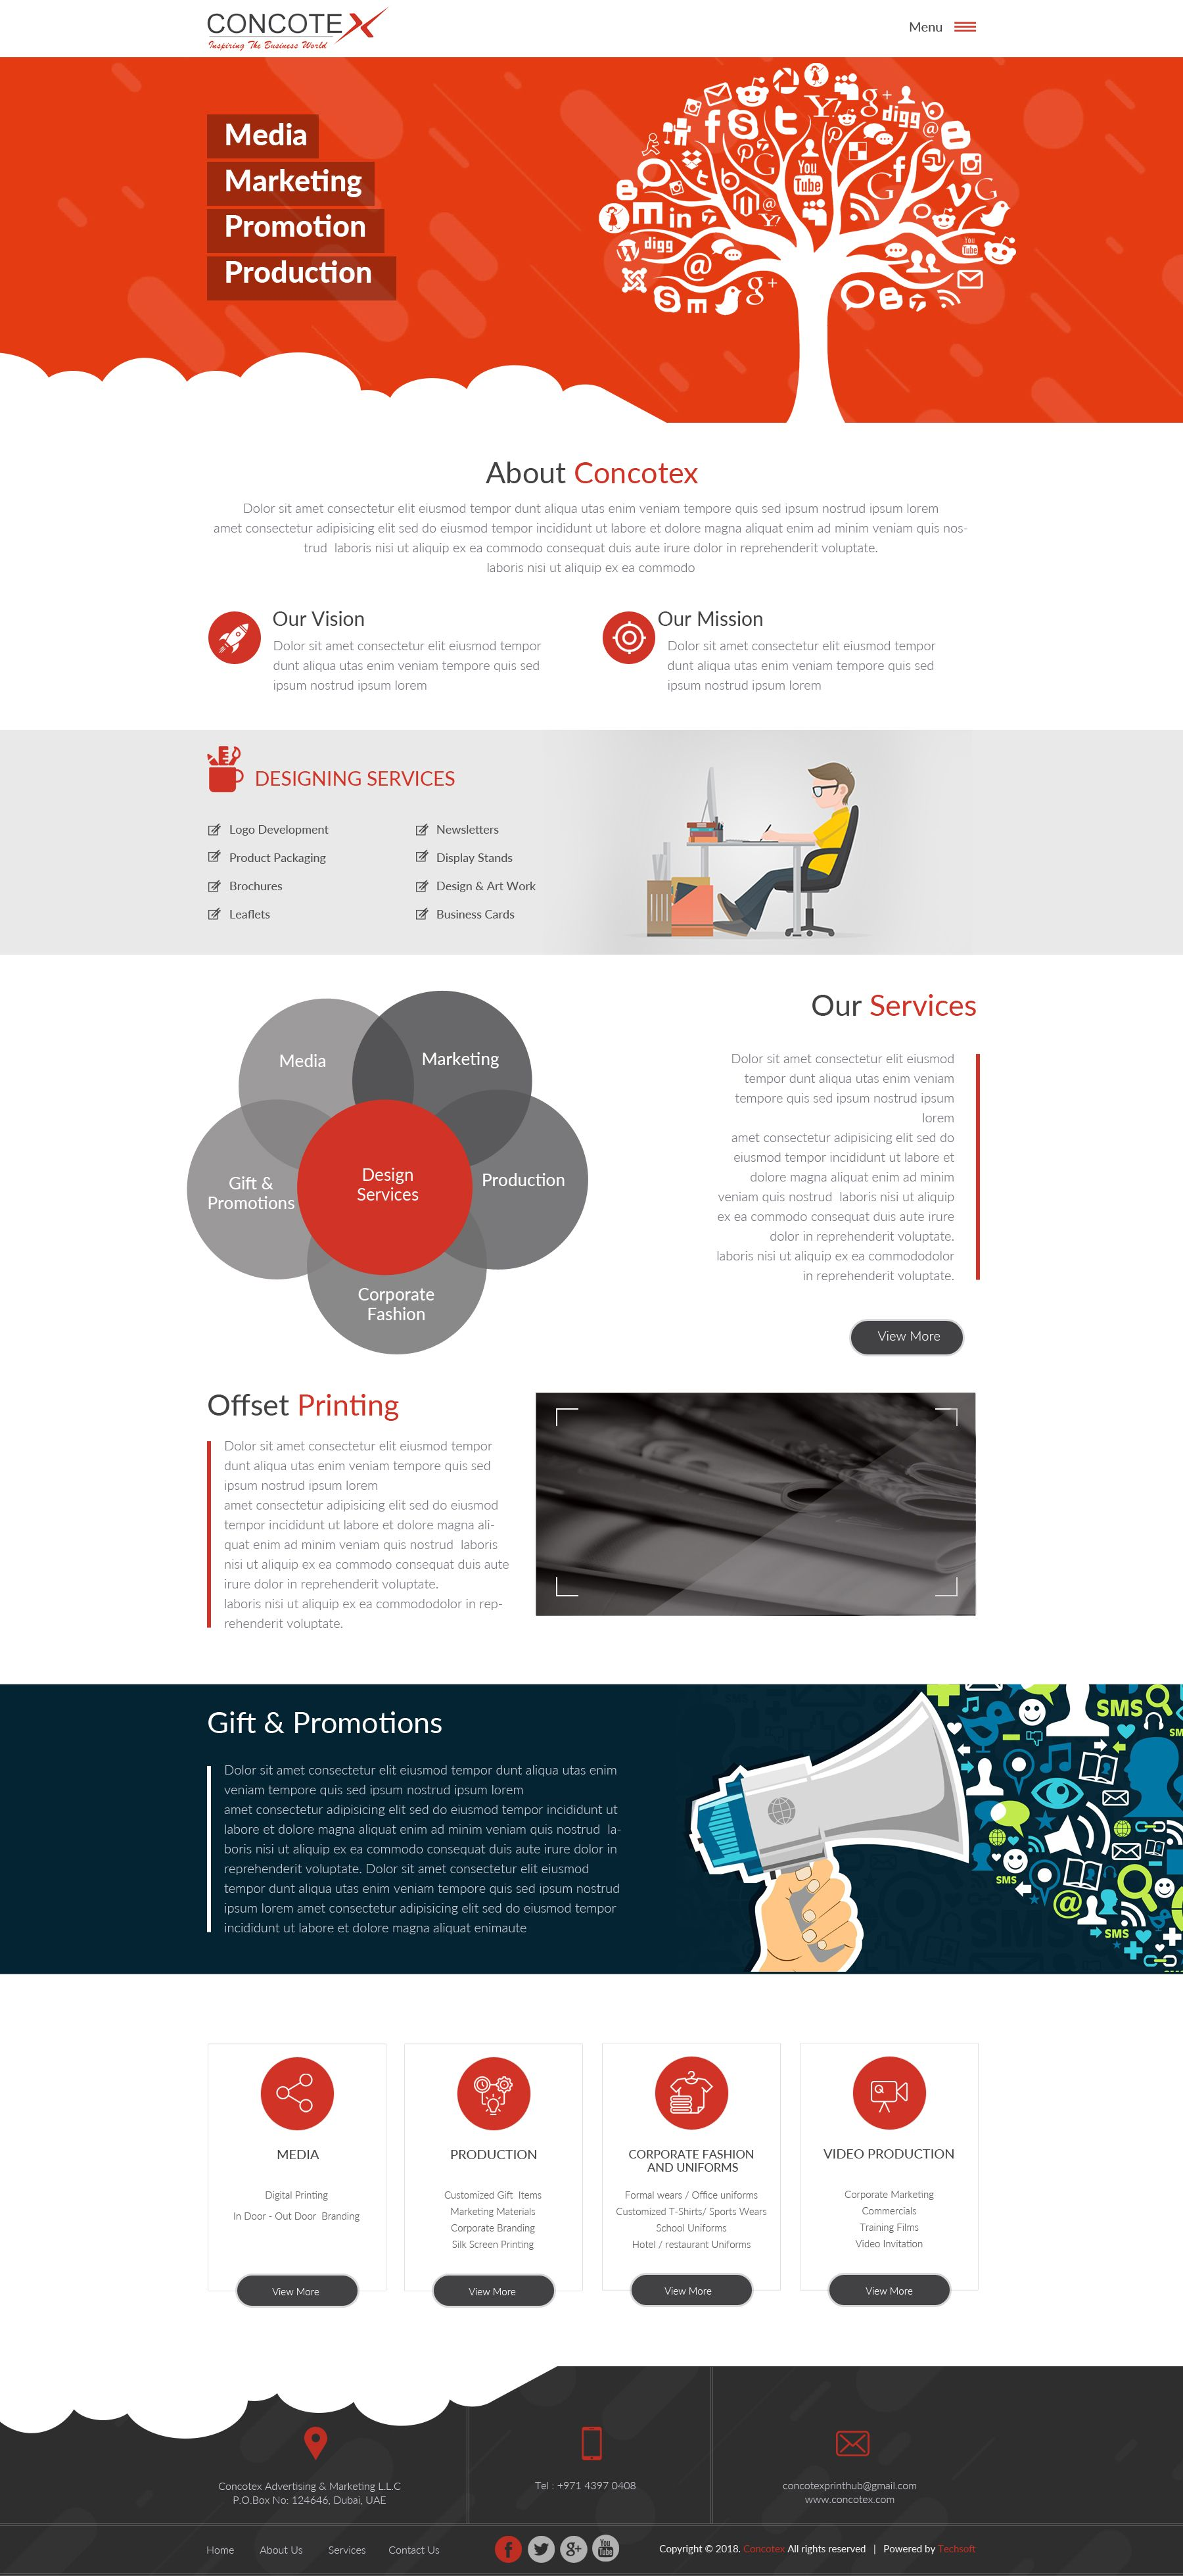 Web Developer And Designer Web Graphic Design Hiring Poster Web Development